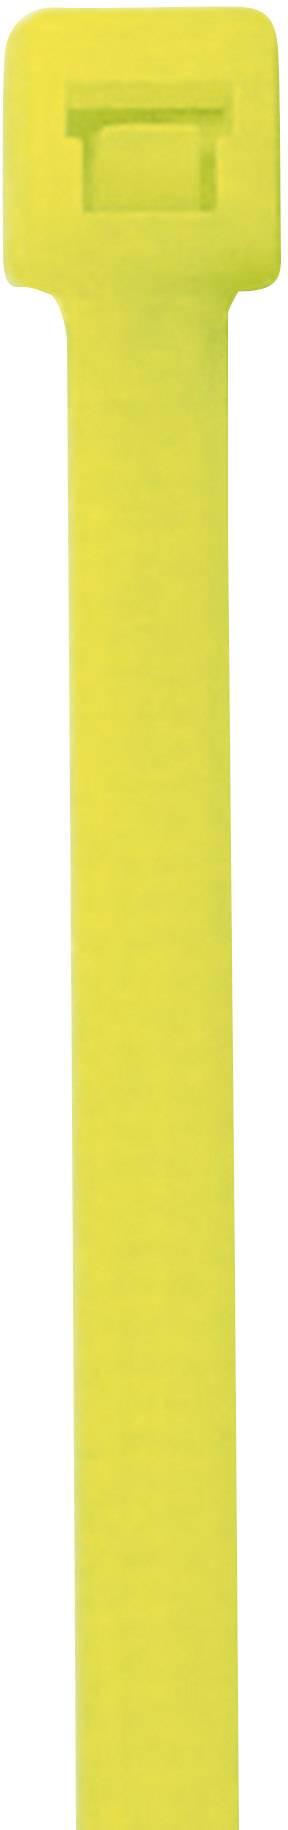 Neonska kabelska vezica, fluorescenčna (D x Š) 285 mm x 4.6 mm rumena, 50 kosov, PB Fastener